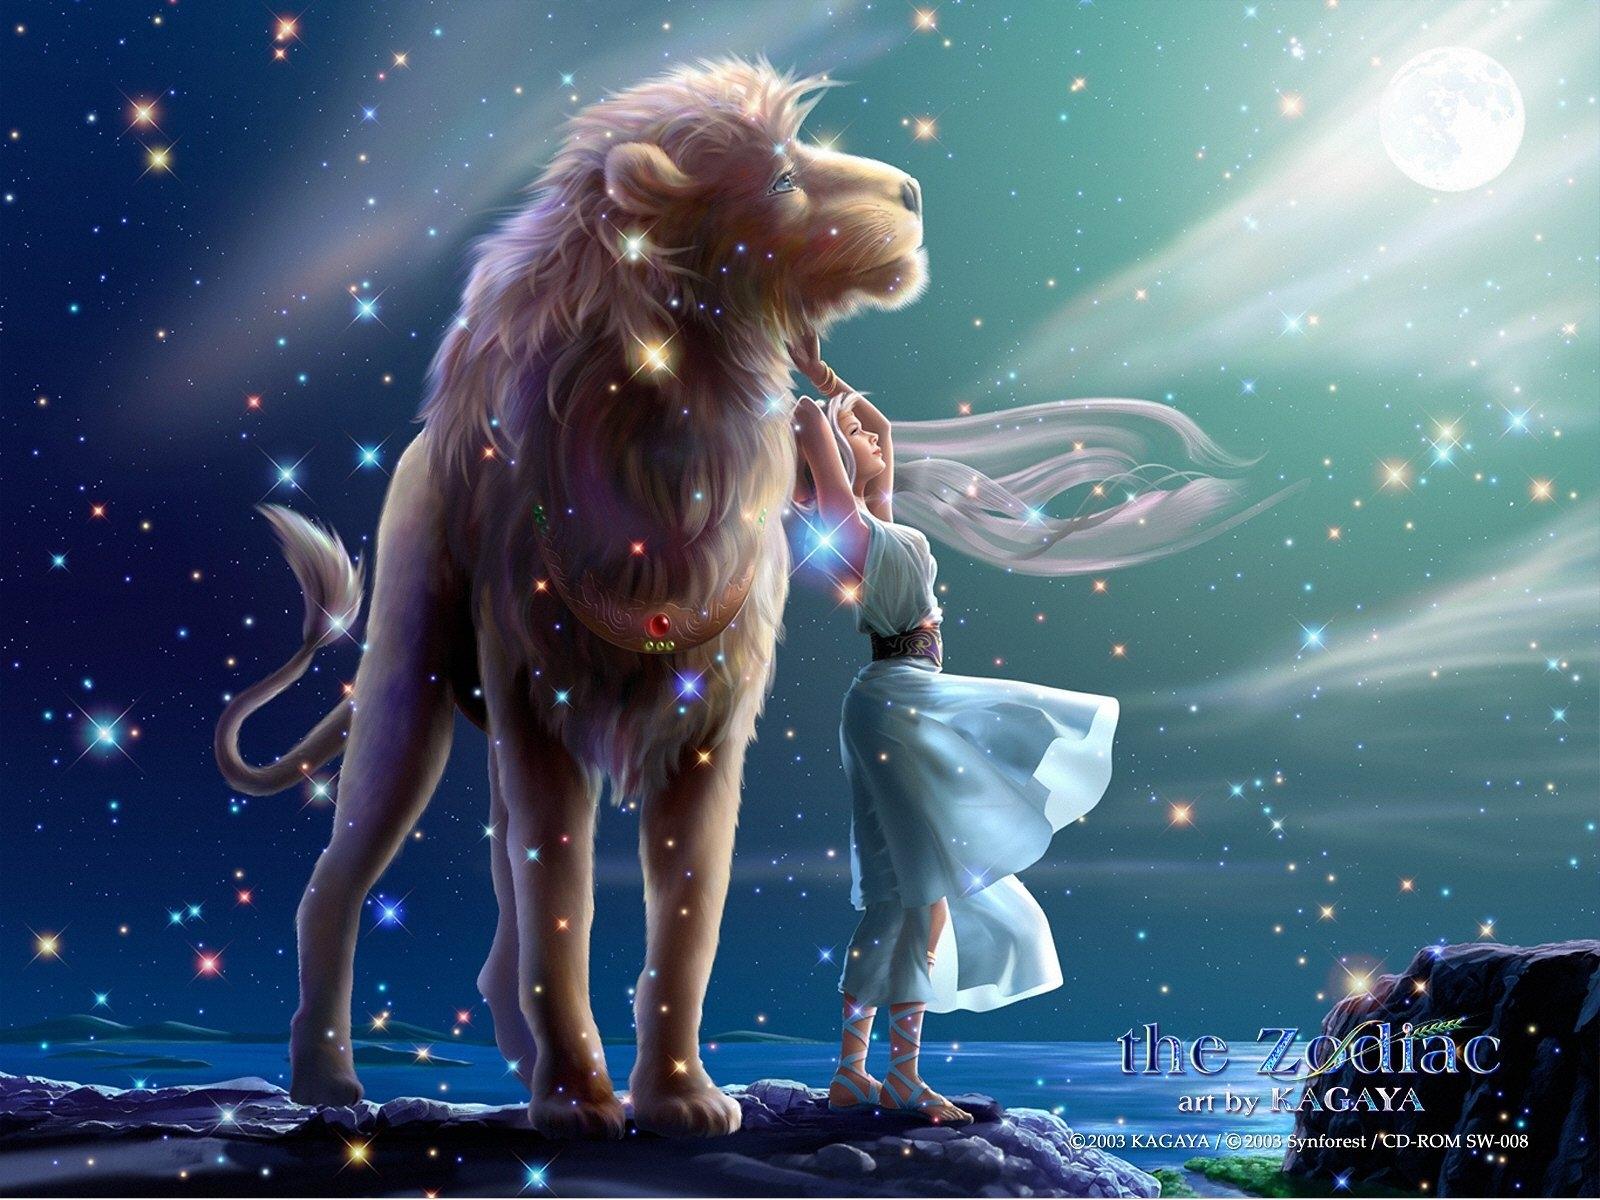 Wallpaper Illustration Anime Space Sky Lion Sign World Mythology Zodiac ART Girl Fun Mammal Screenshot Computer Vertebrate